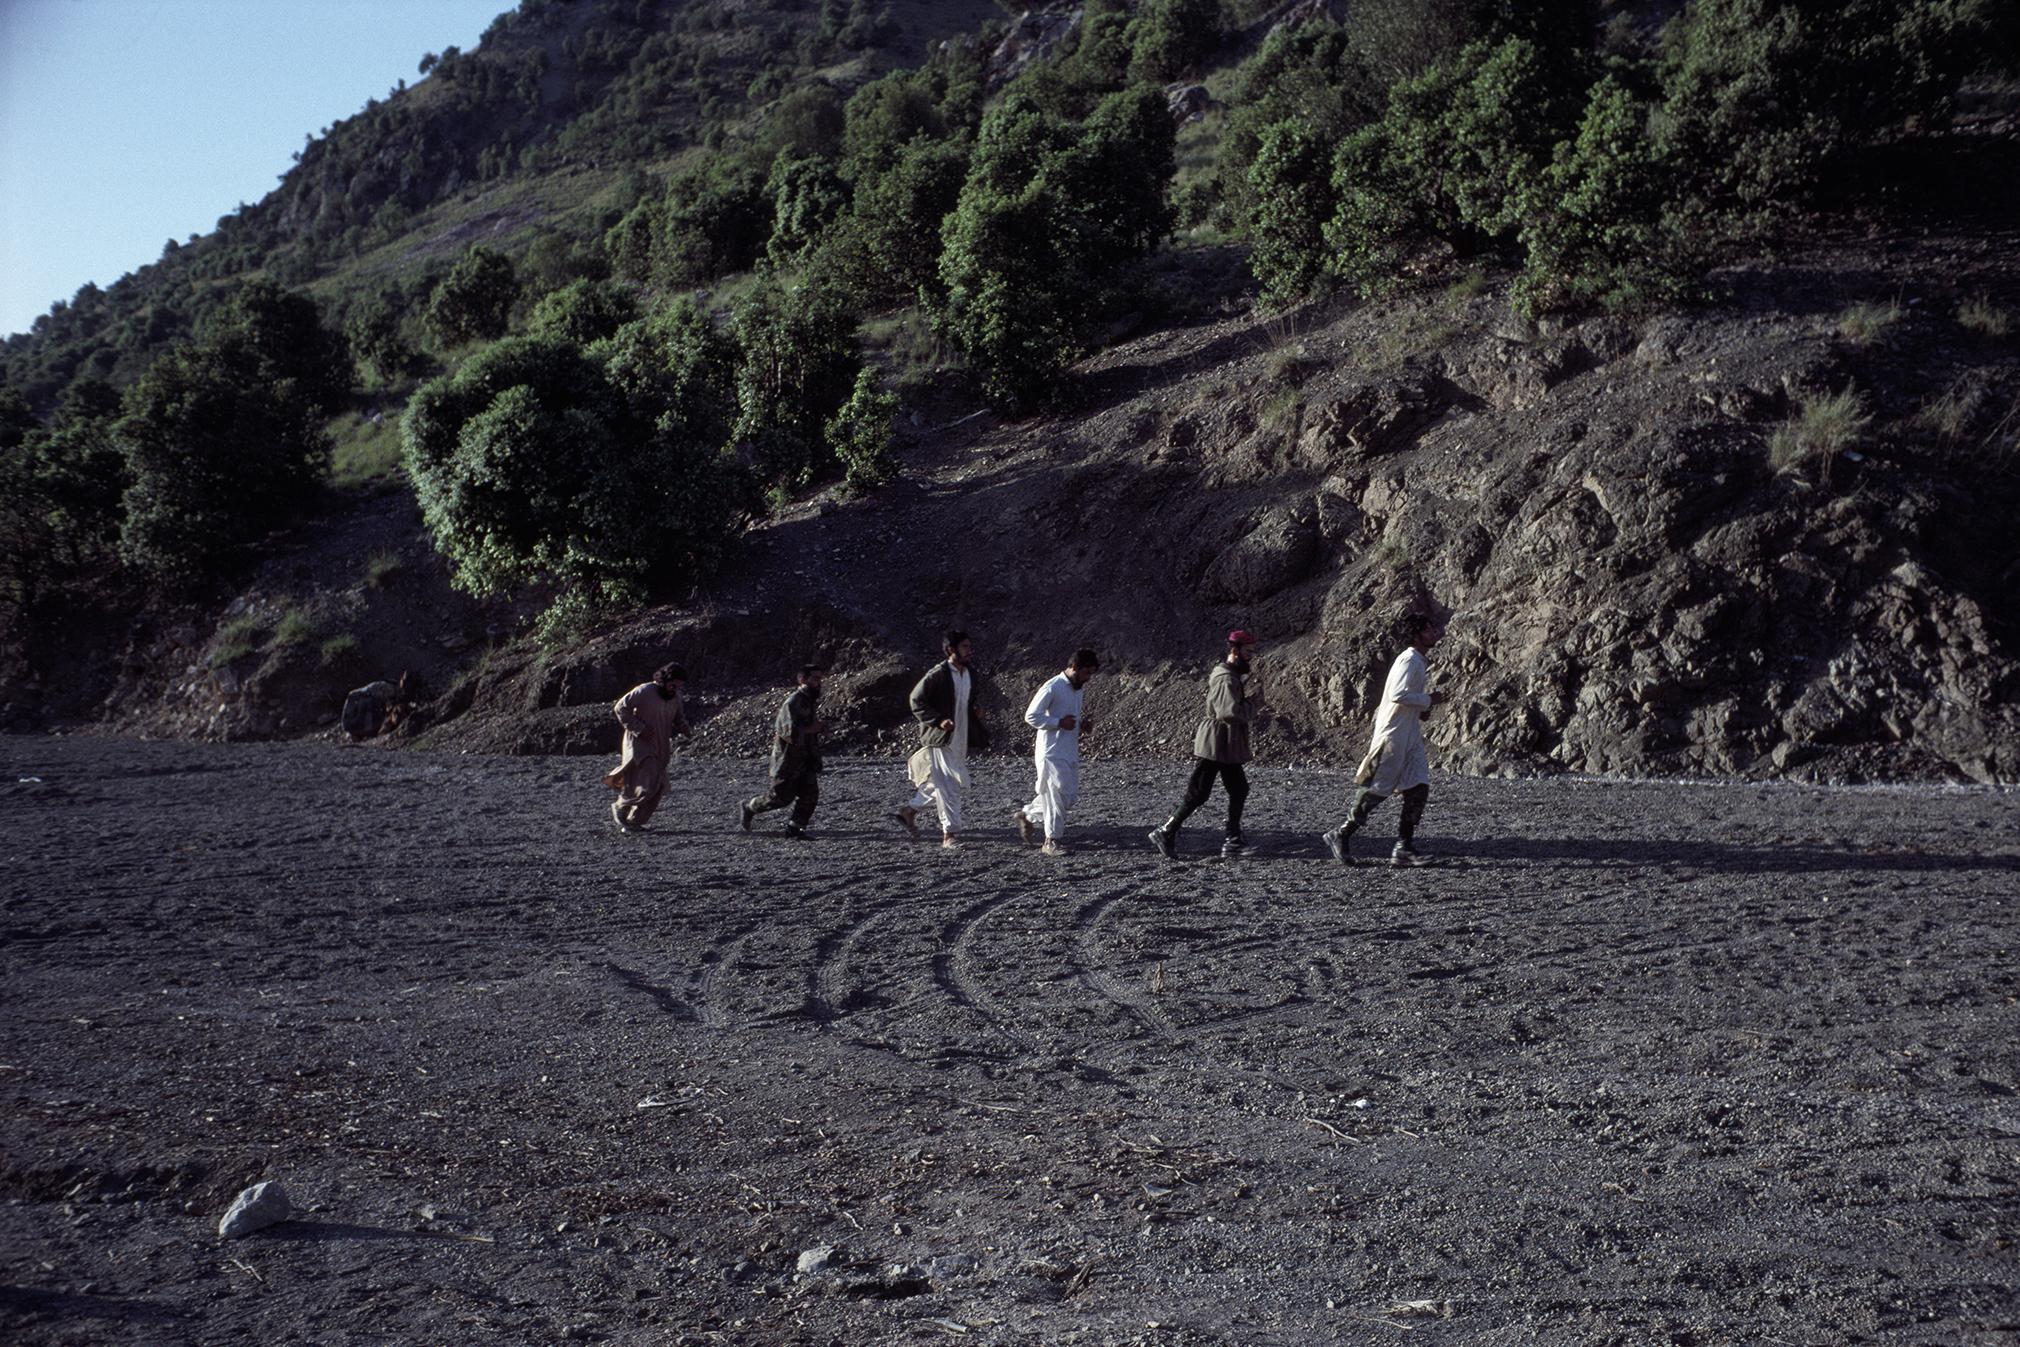 May 1990: Arab Al Qaeda members and Afghan mujahideen jog at a Zhawar training camp outside of Khost, Afghanistan.